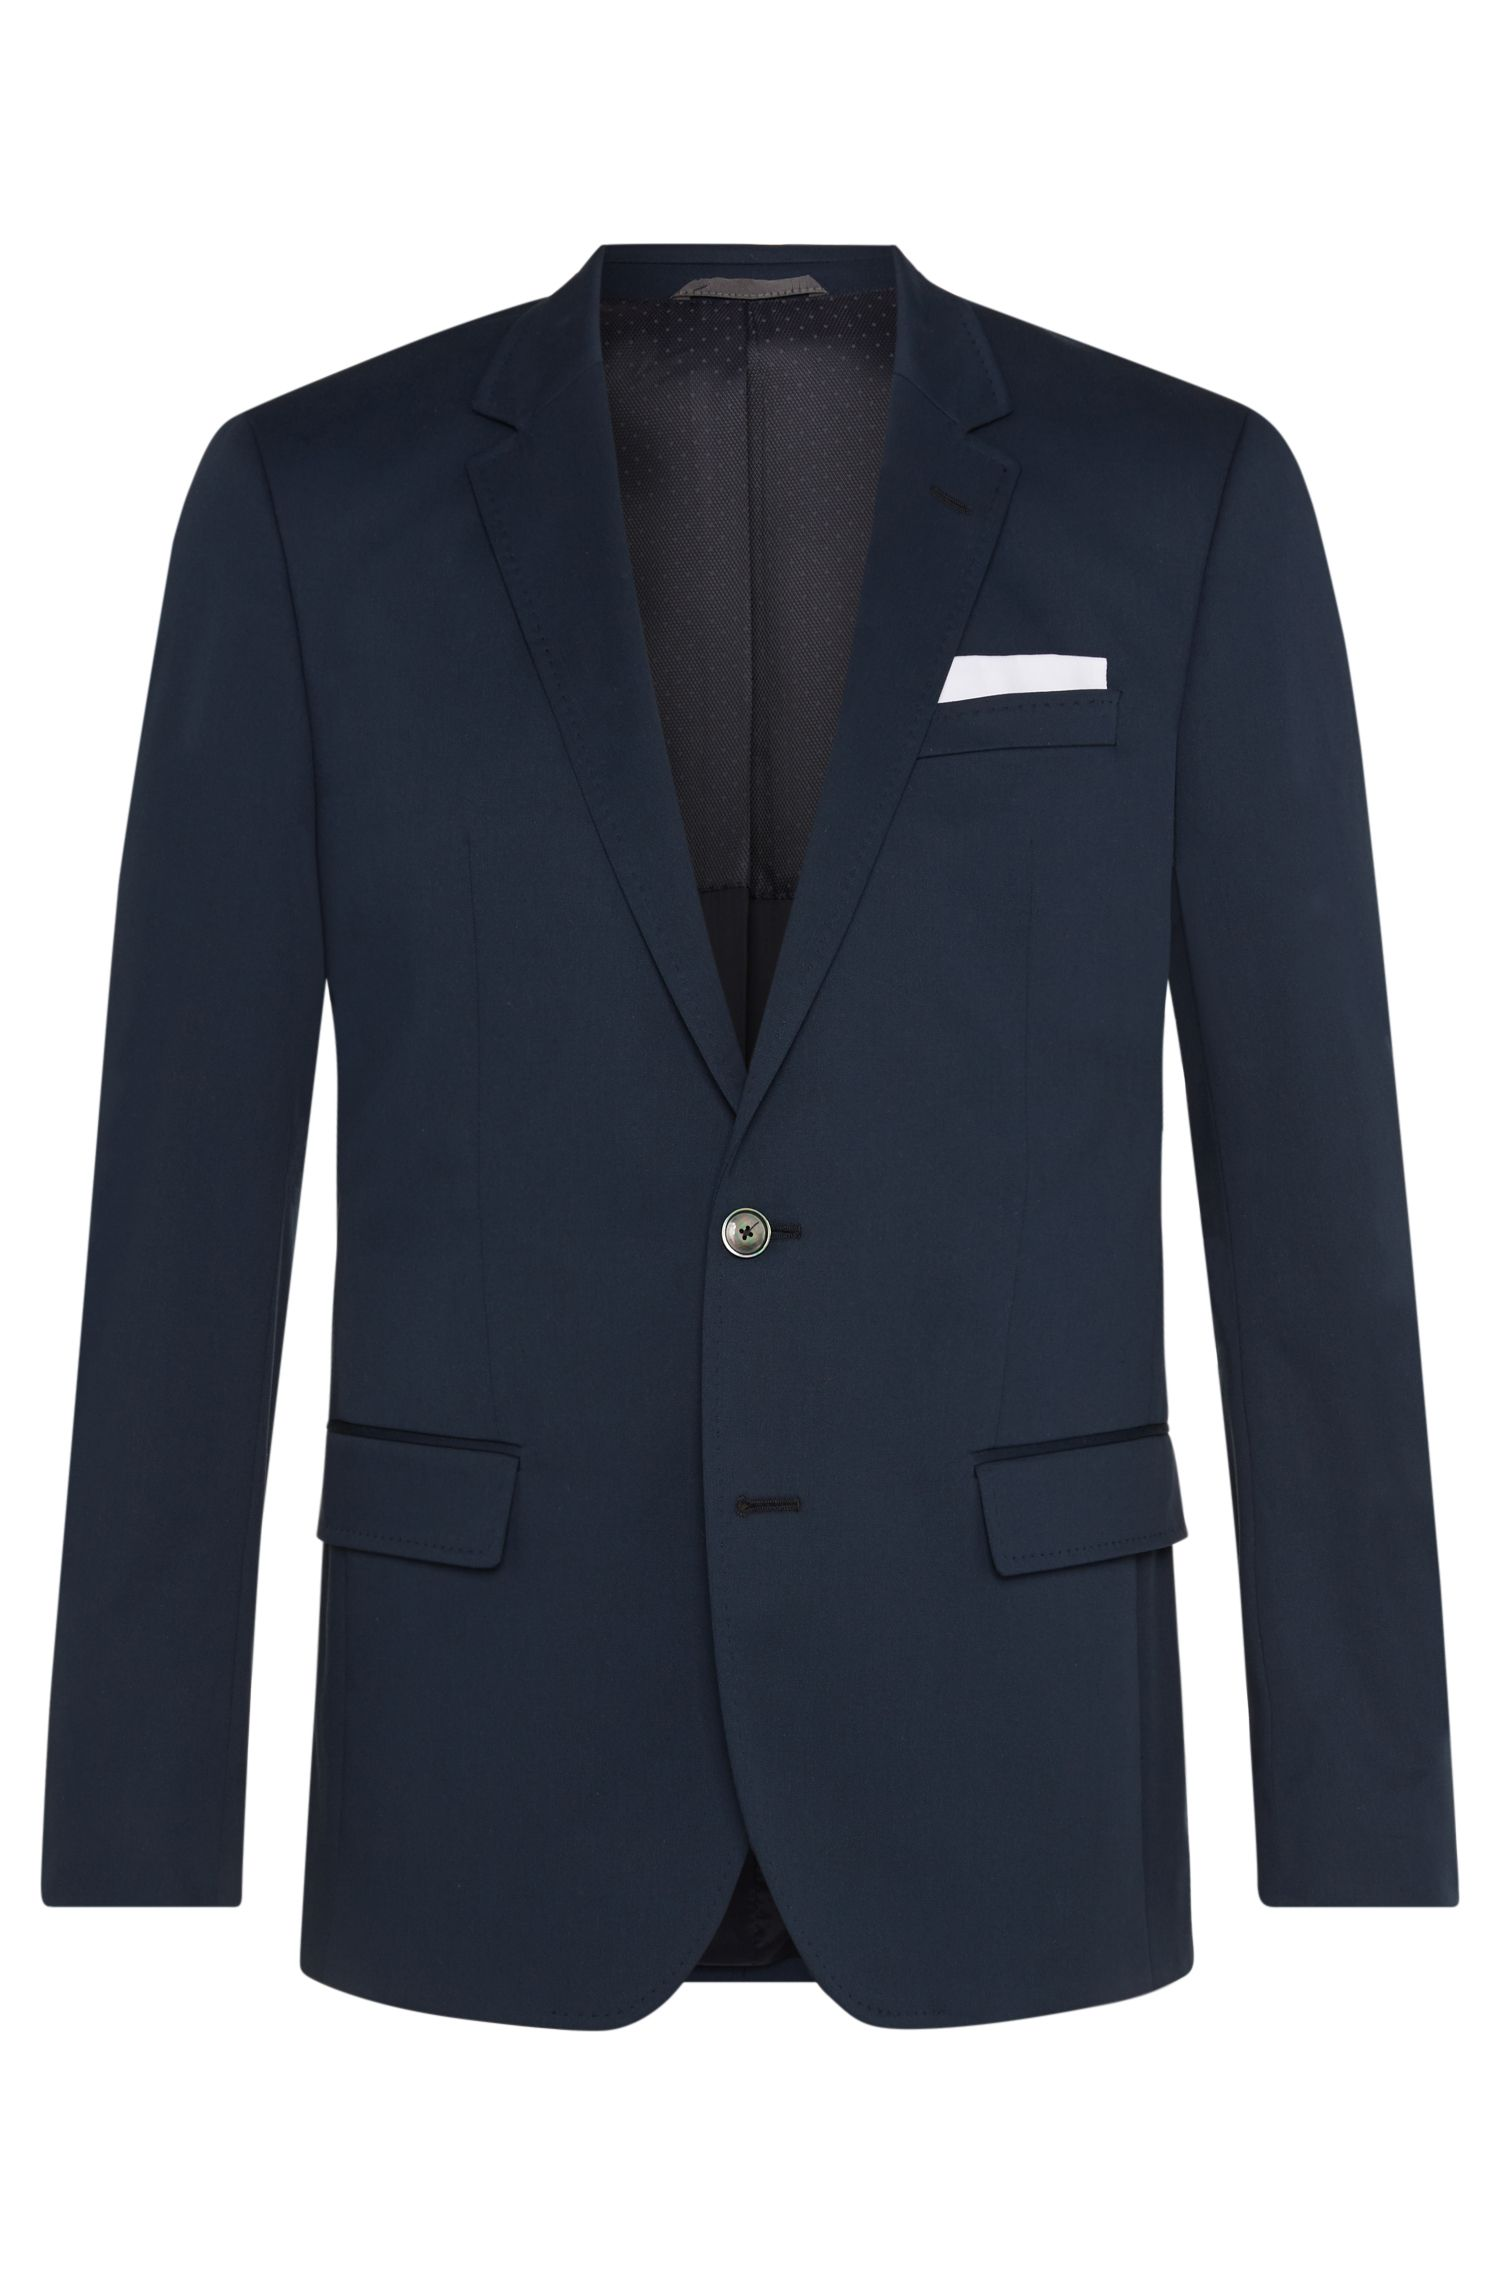 'Hutsons' | Slim Fit, Stretch Cotton Sport Coat